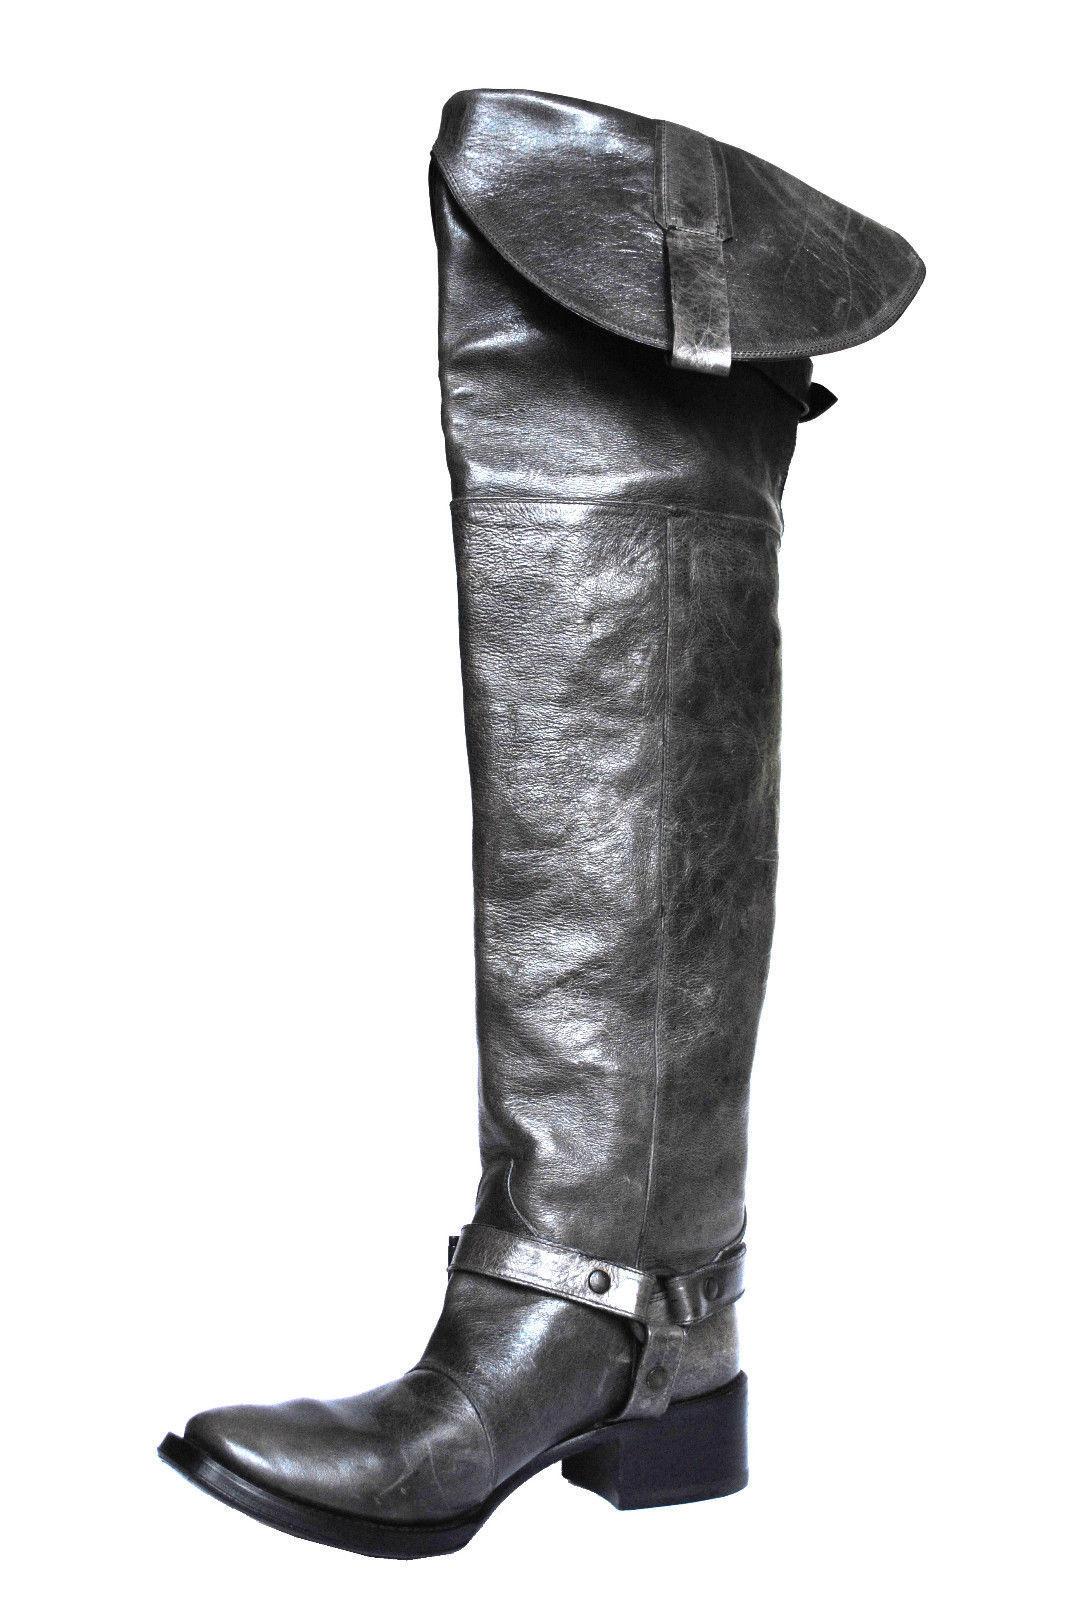 Stiefel Schuhe Overknee JIANNI JIANNI JIANNI BARBATO ITALY